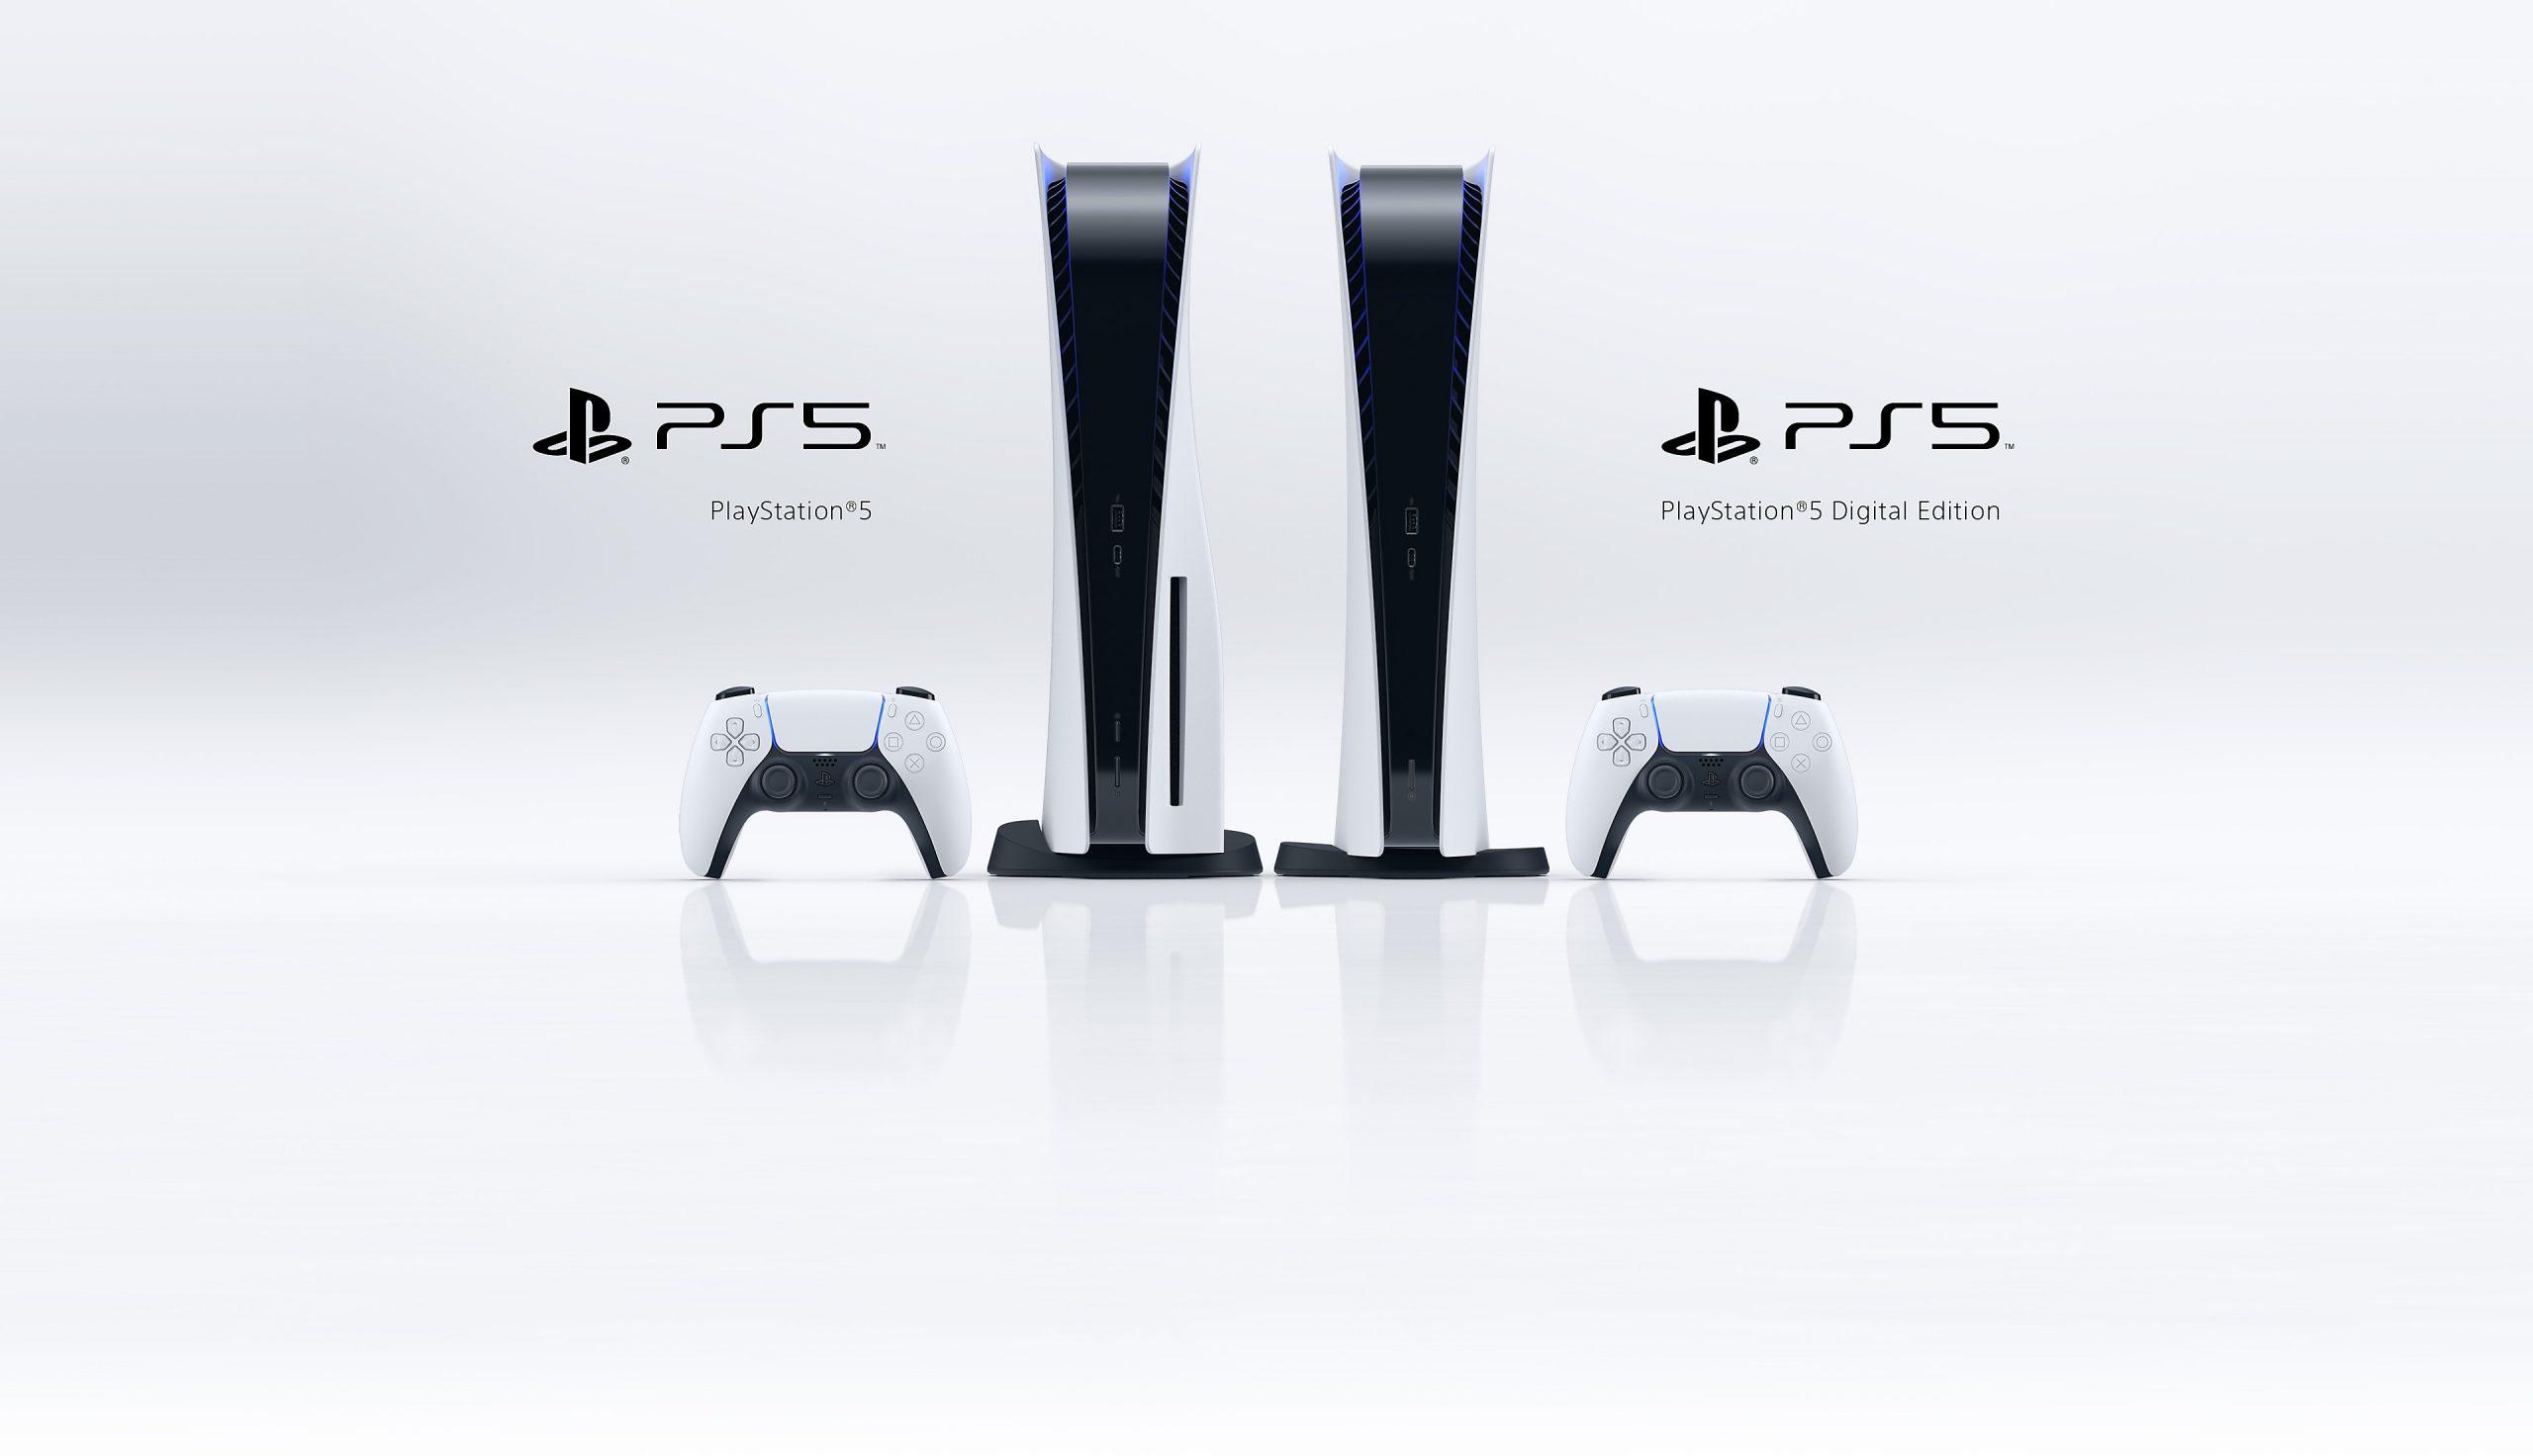 PlayStation 5 and PS5 Digital Edition